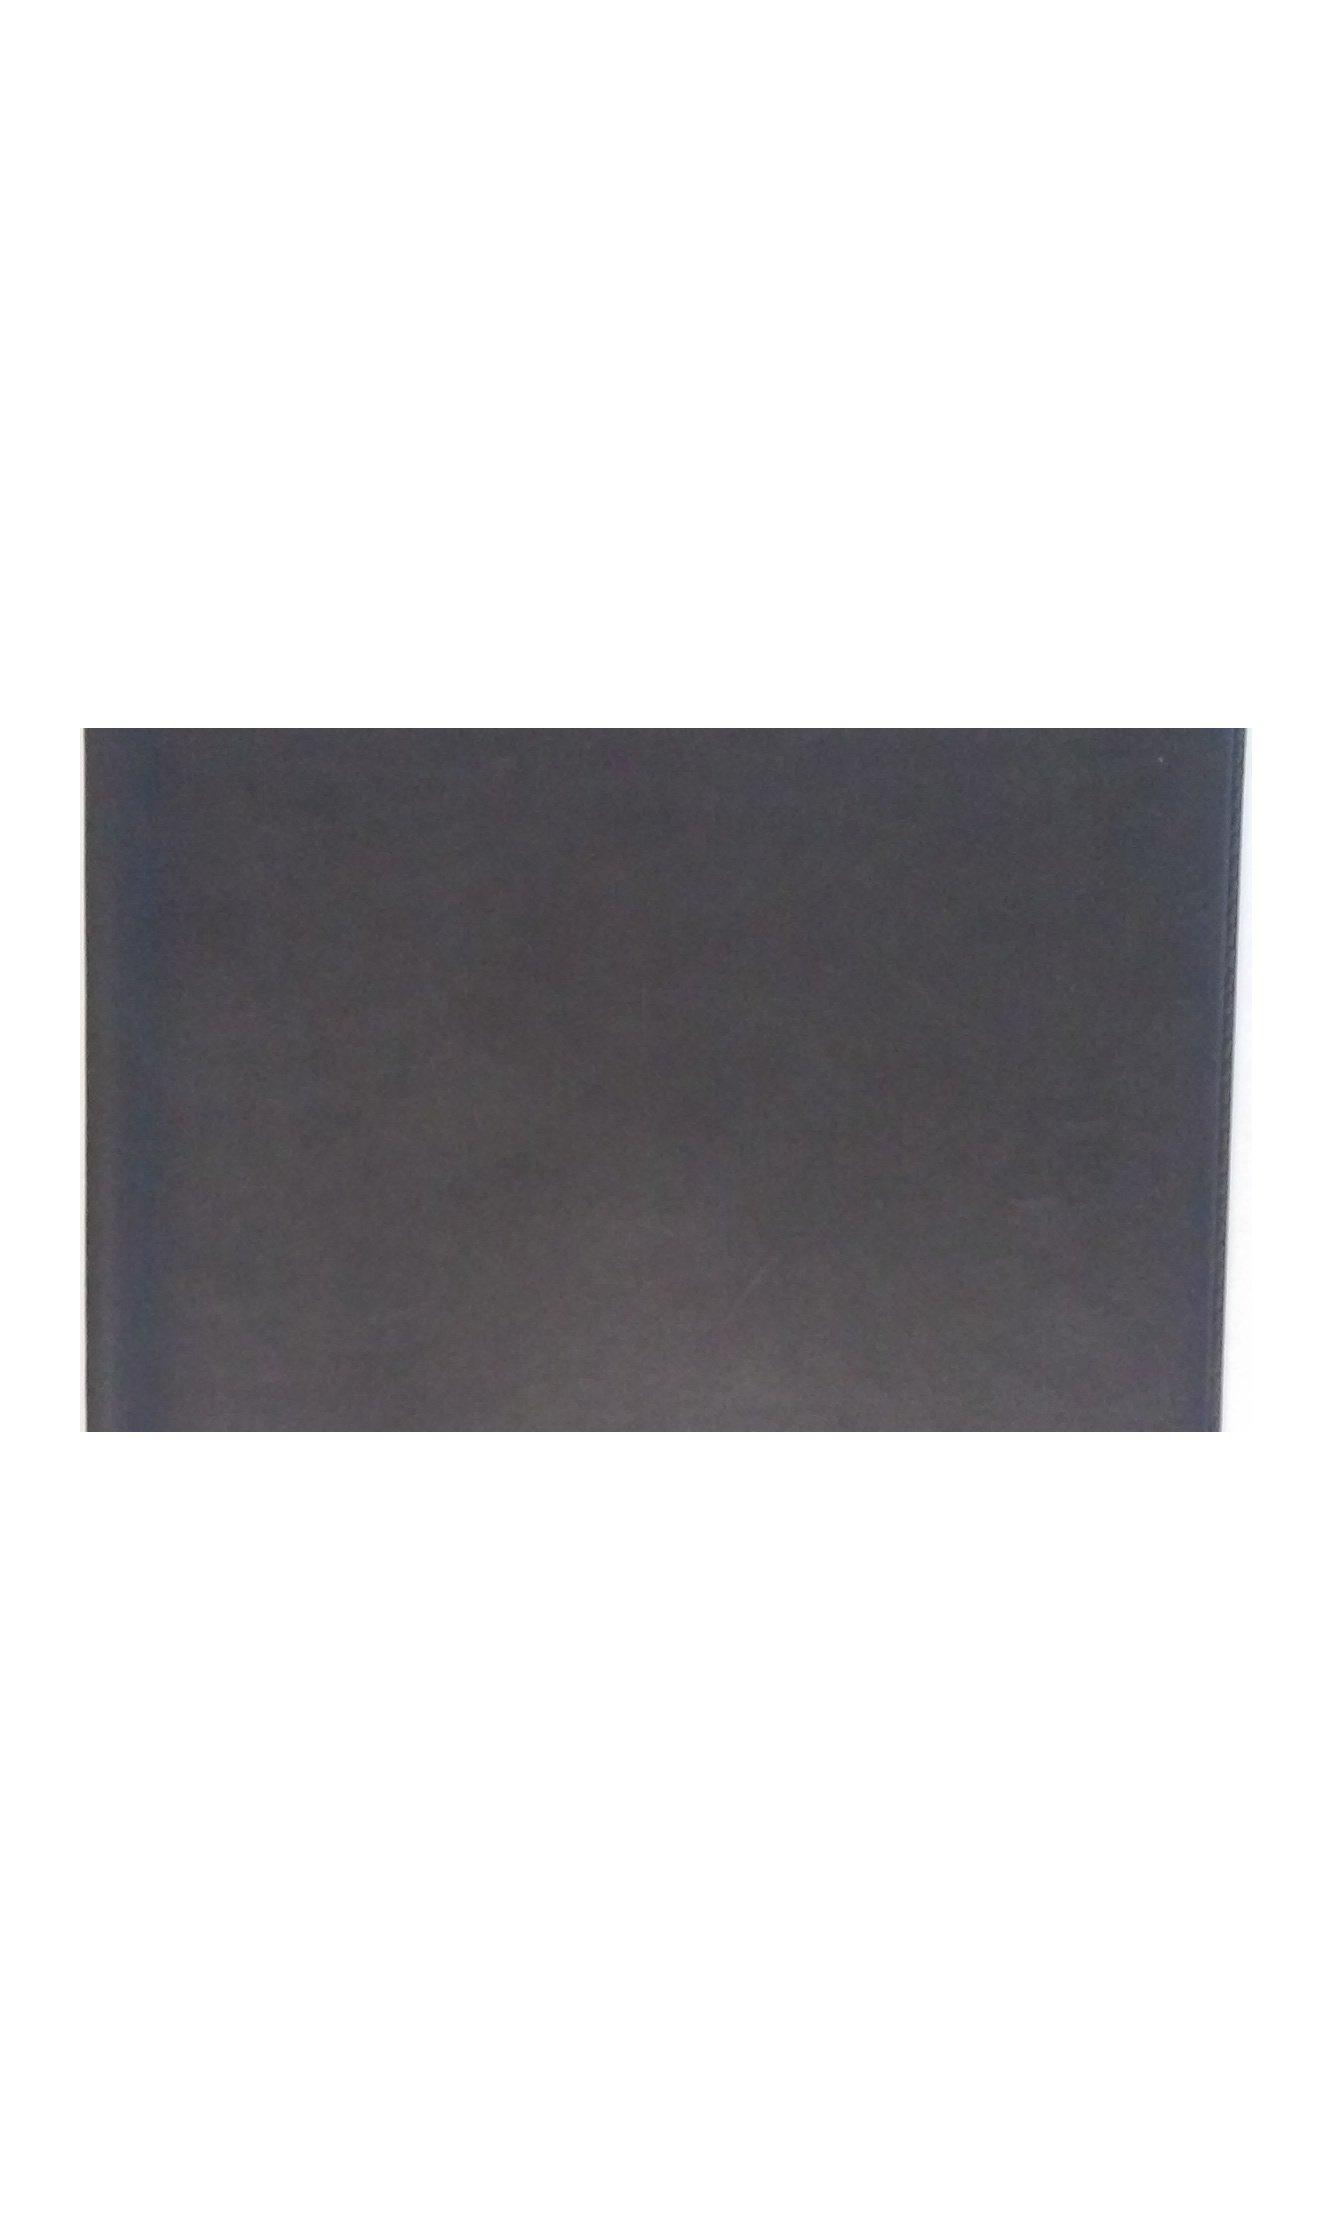 Quo Vadis 2019 Business Weekly Pocket 4'' x 6'' (10 x 15 cm) Texas Cover (Black)